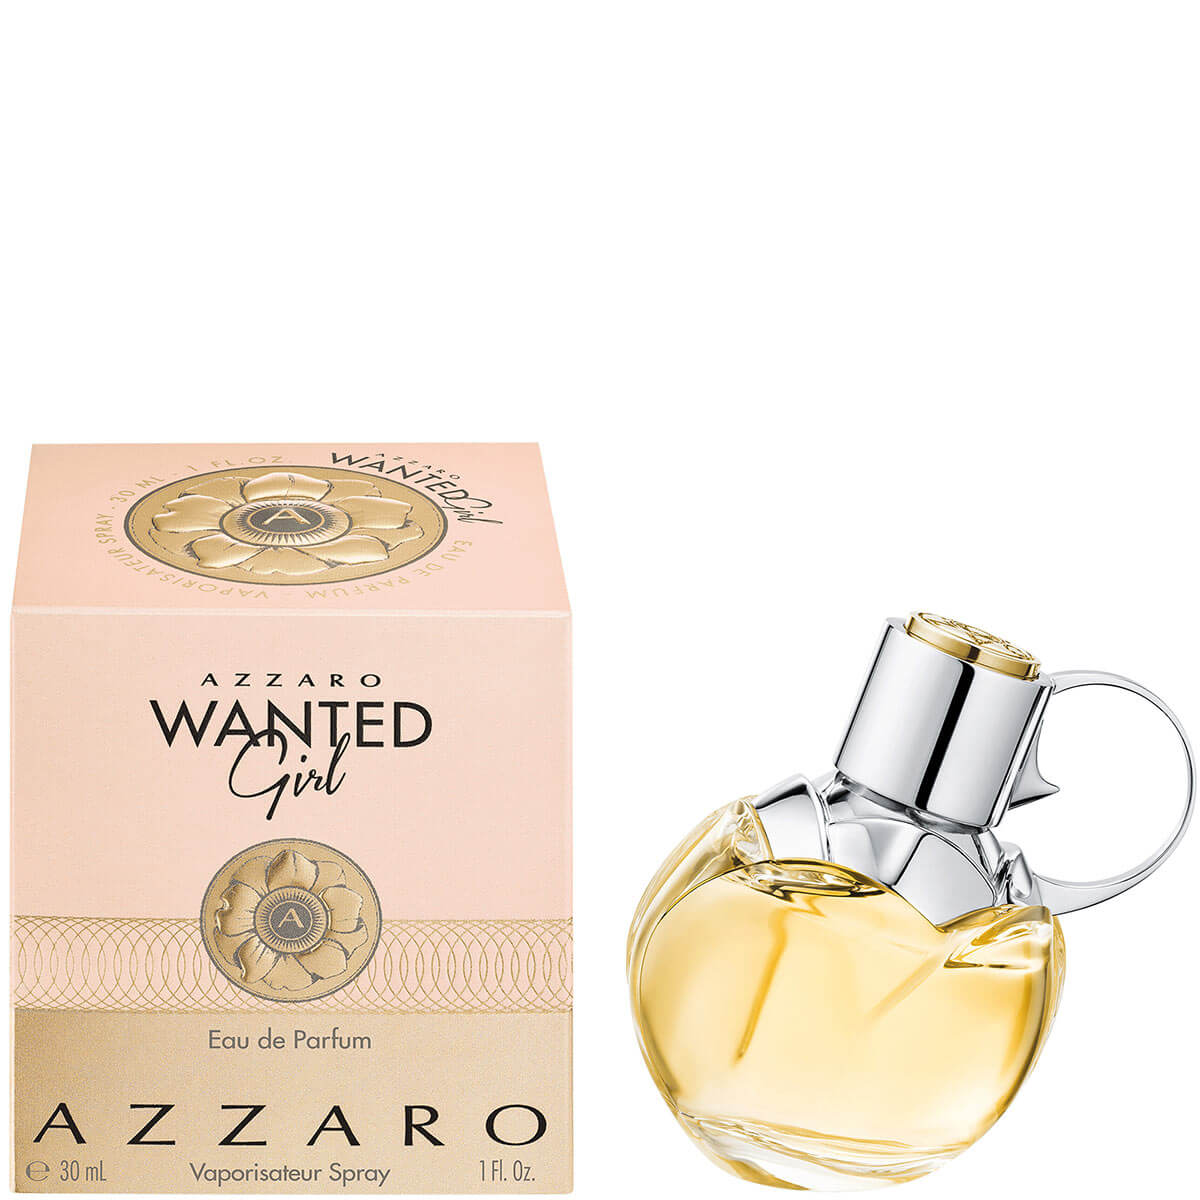 Azzaro Azzaro Wanted Girl Wanted Azzaro Girl Azzaro Girl Wanted Girl Wanted rdxshQtC